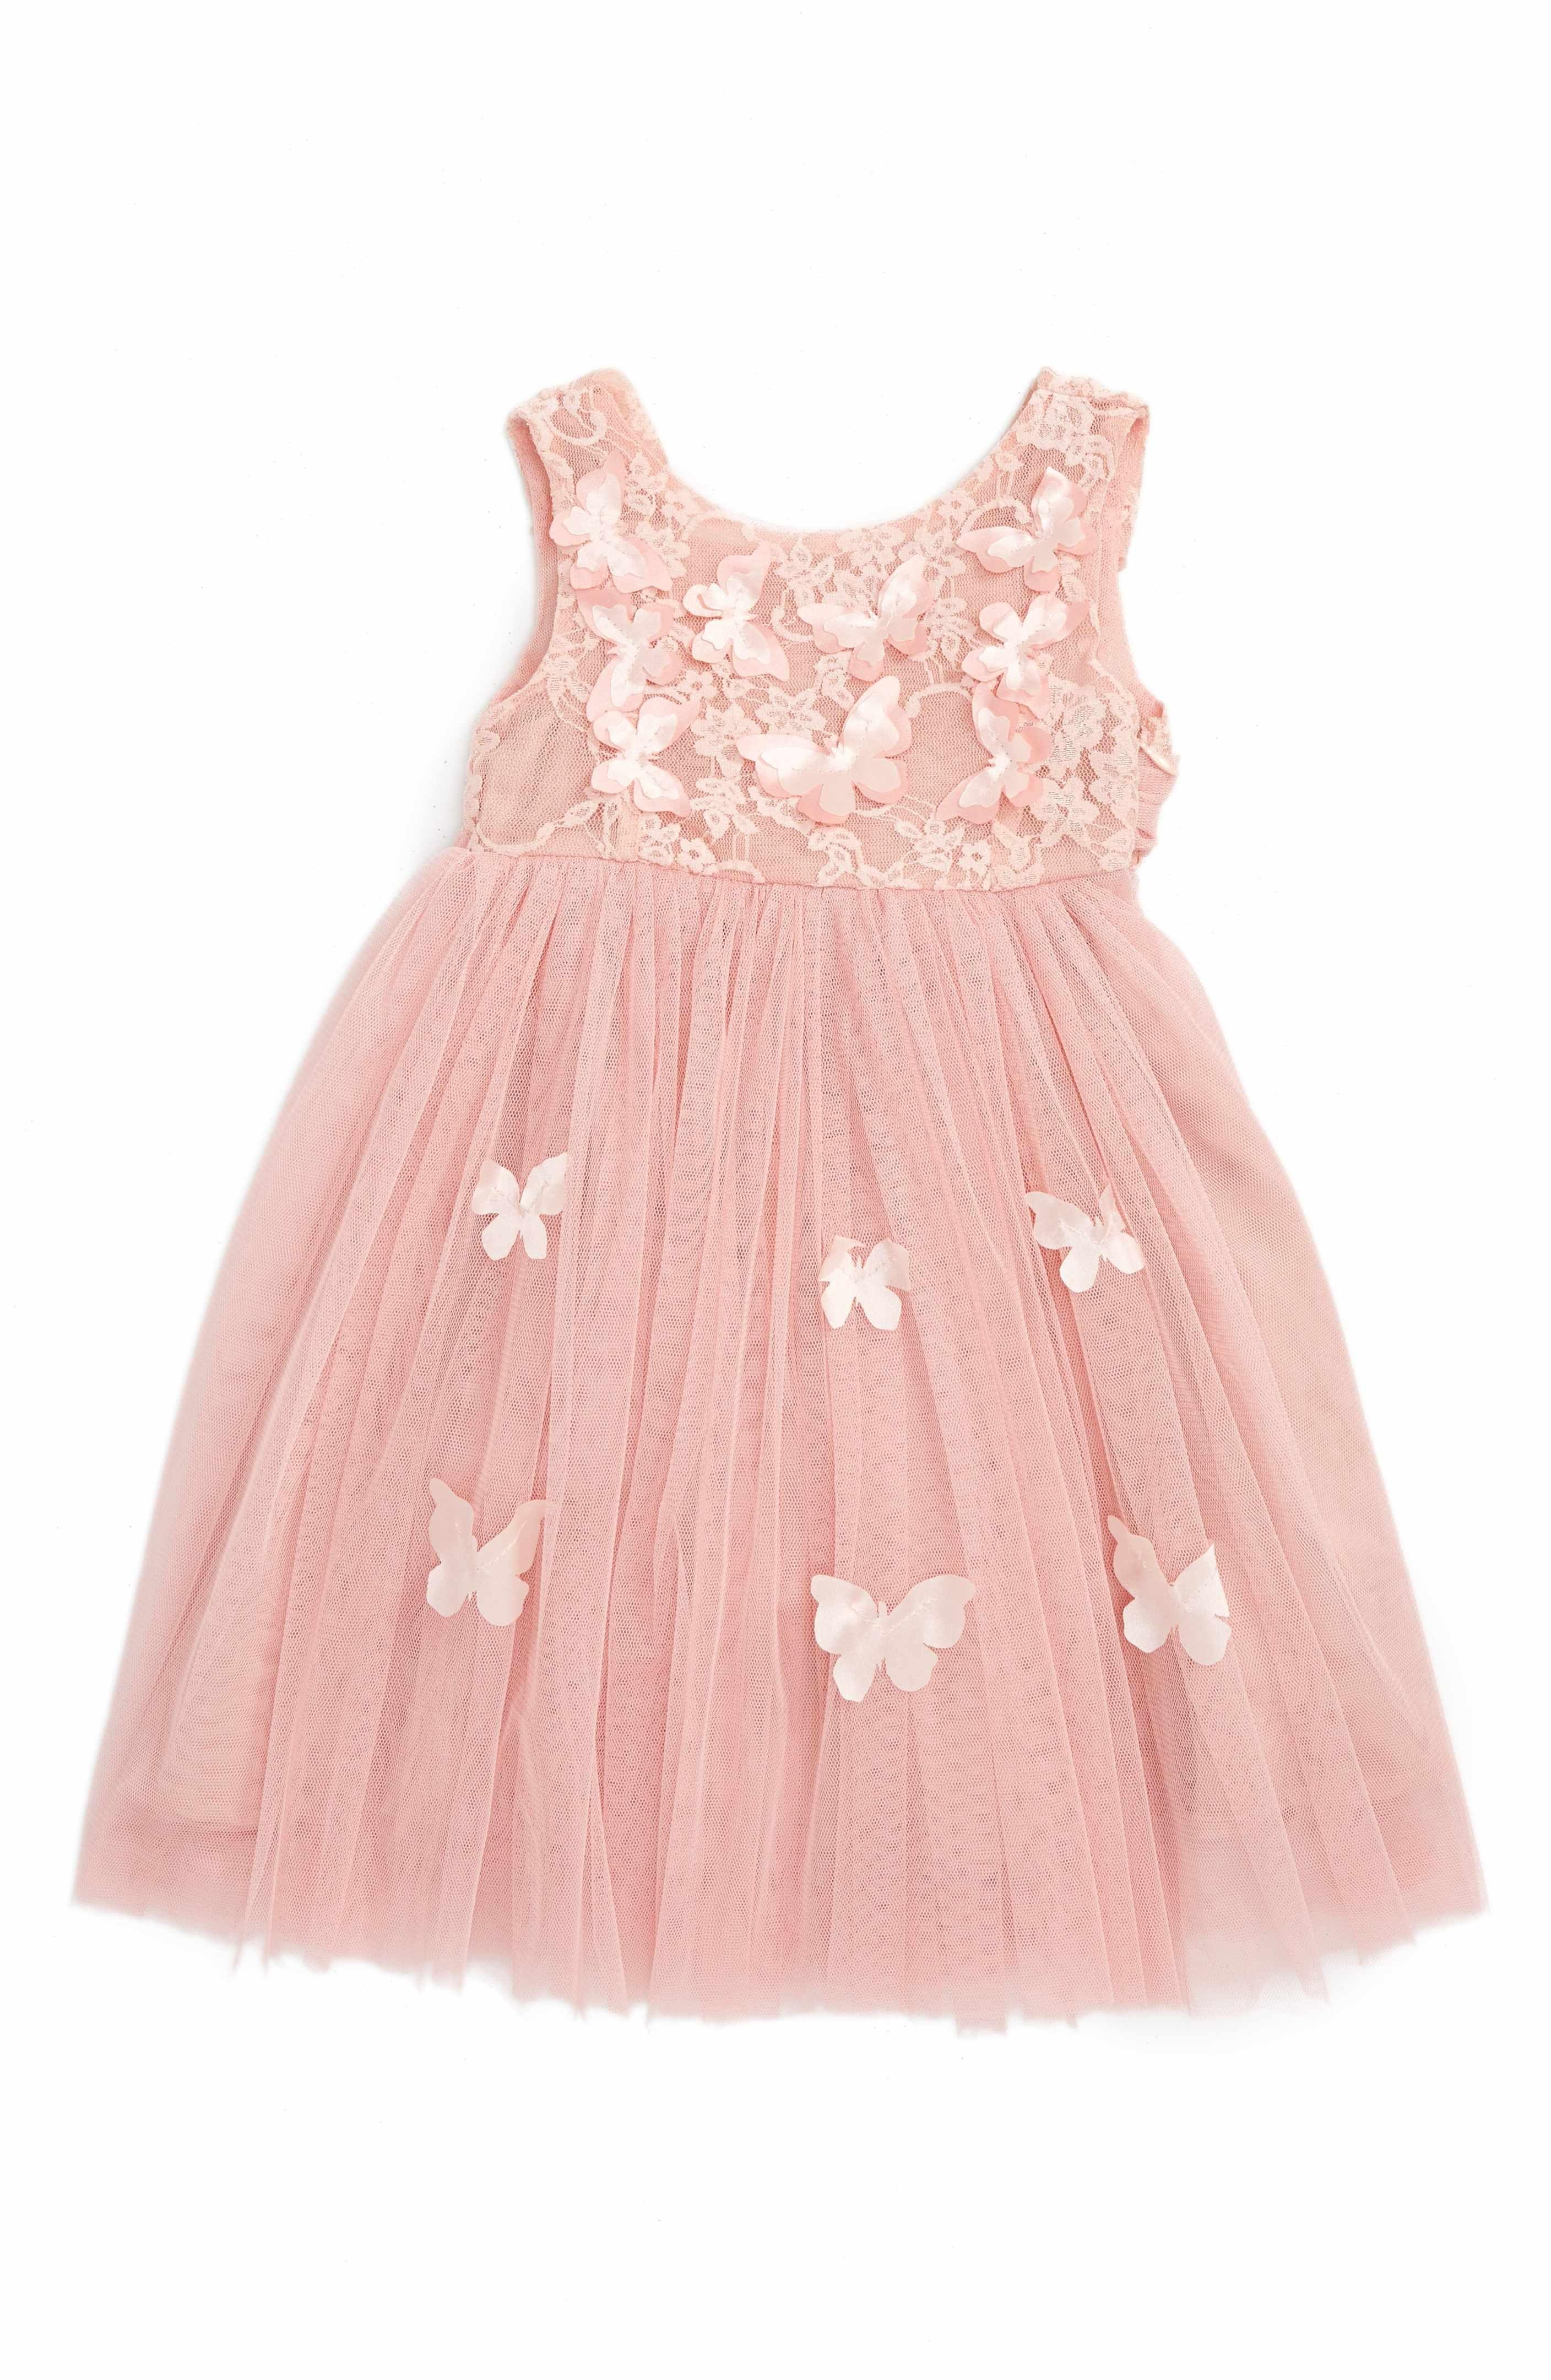 Main Image Popatu Butterfly Sleeveless Dress Baby Girls